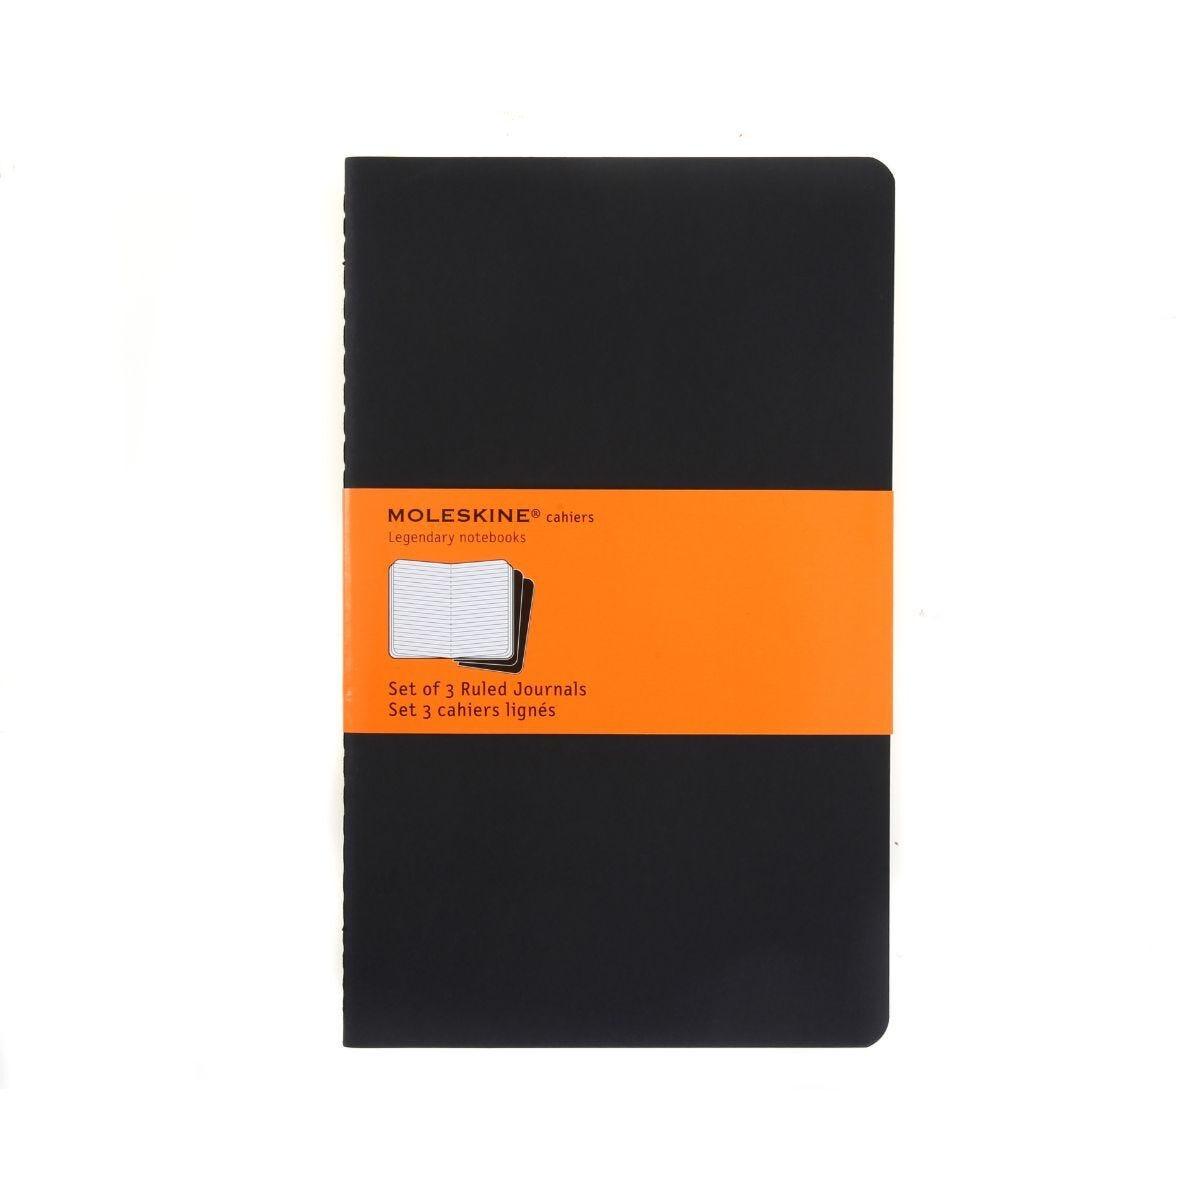 Moleskine Cahiers Ruled Large Notebook Pack of 3 Black